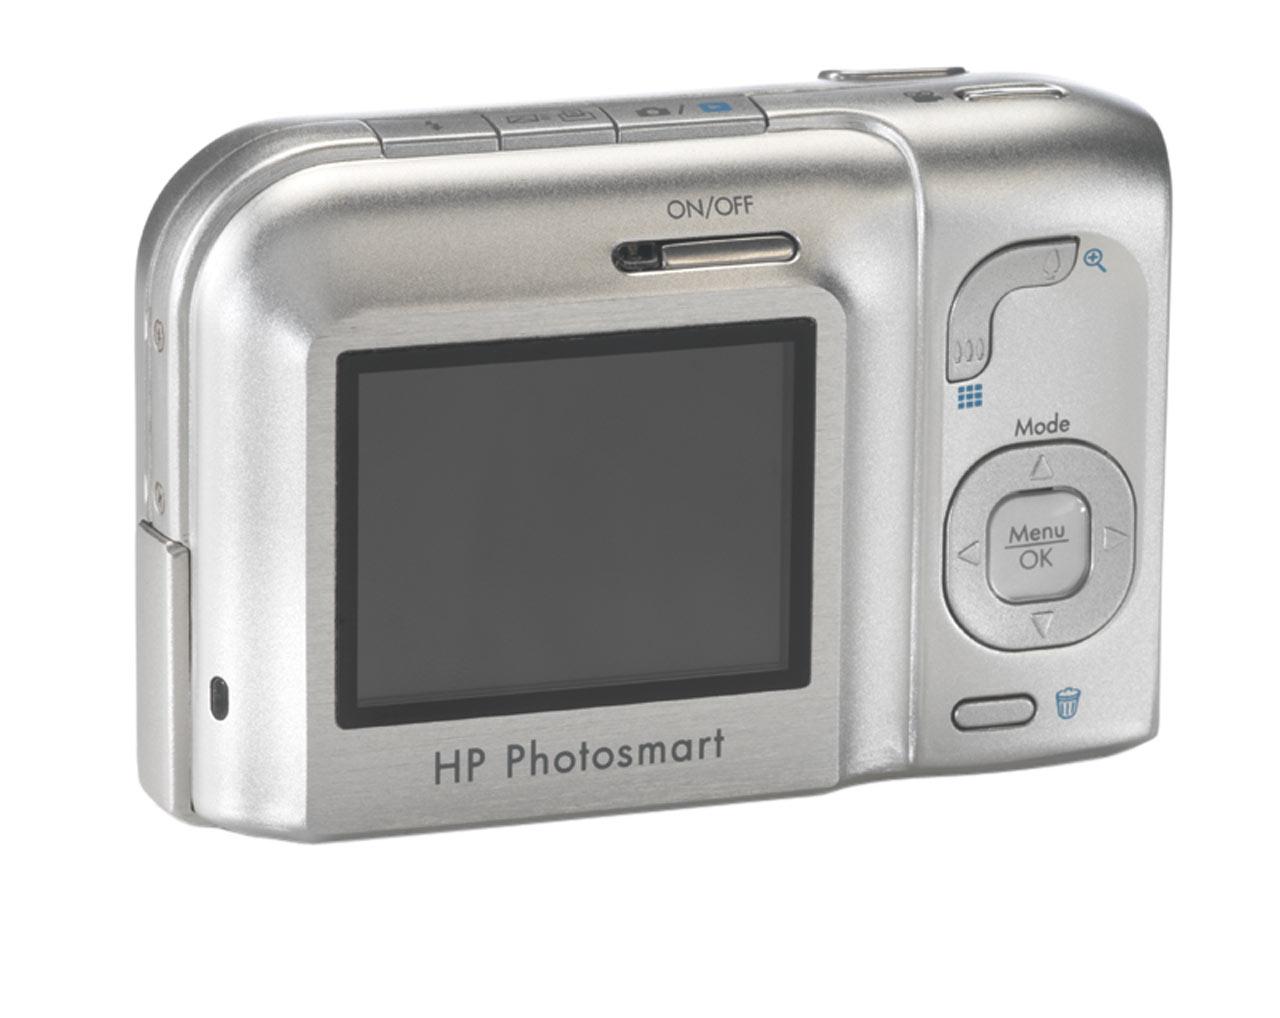 hp photosmart m527 digital photography review rh dpreview com